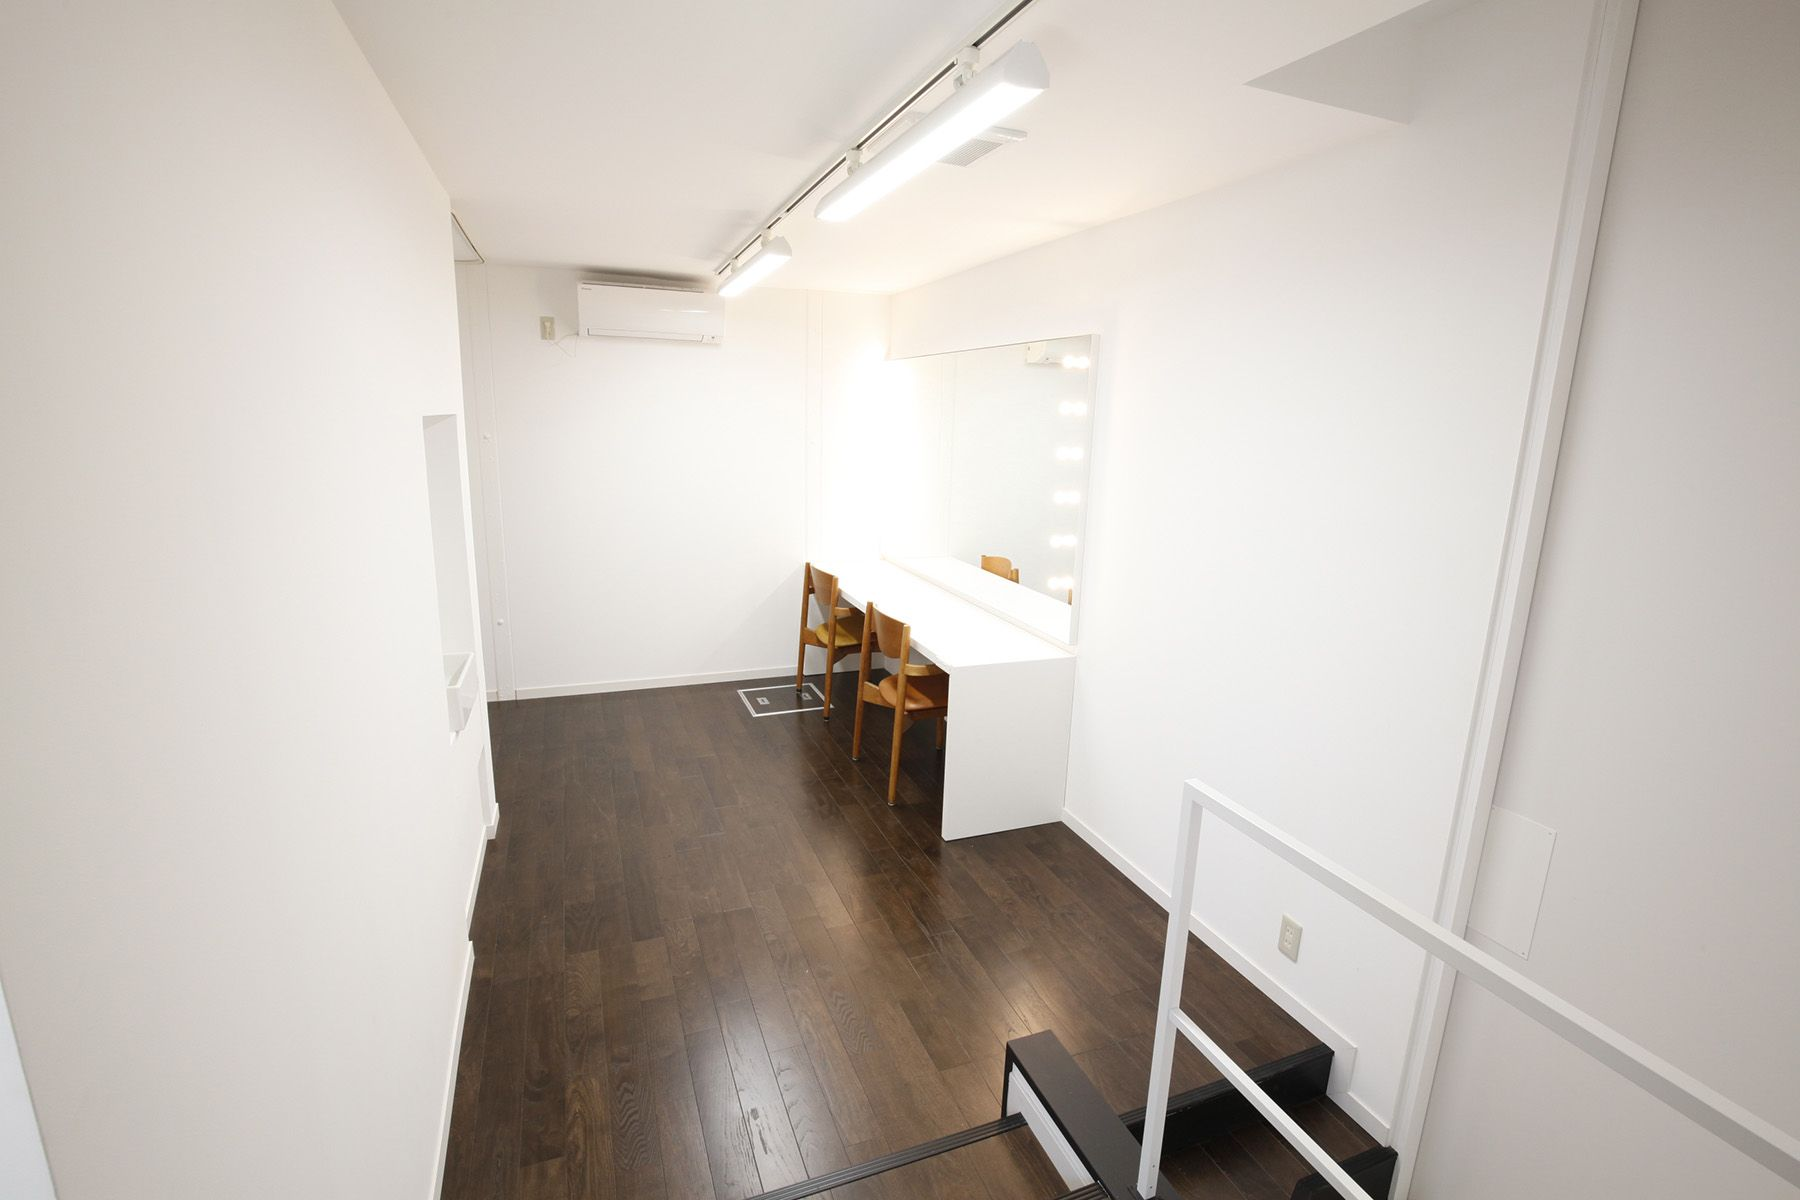 BASE STUDIO HIGASHIYAMA (ベース スタジオ)1F床塗装